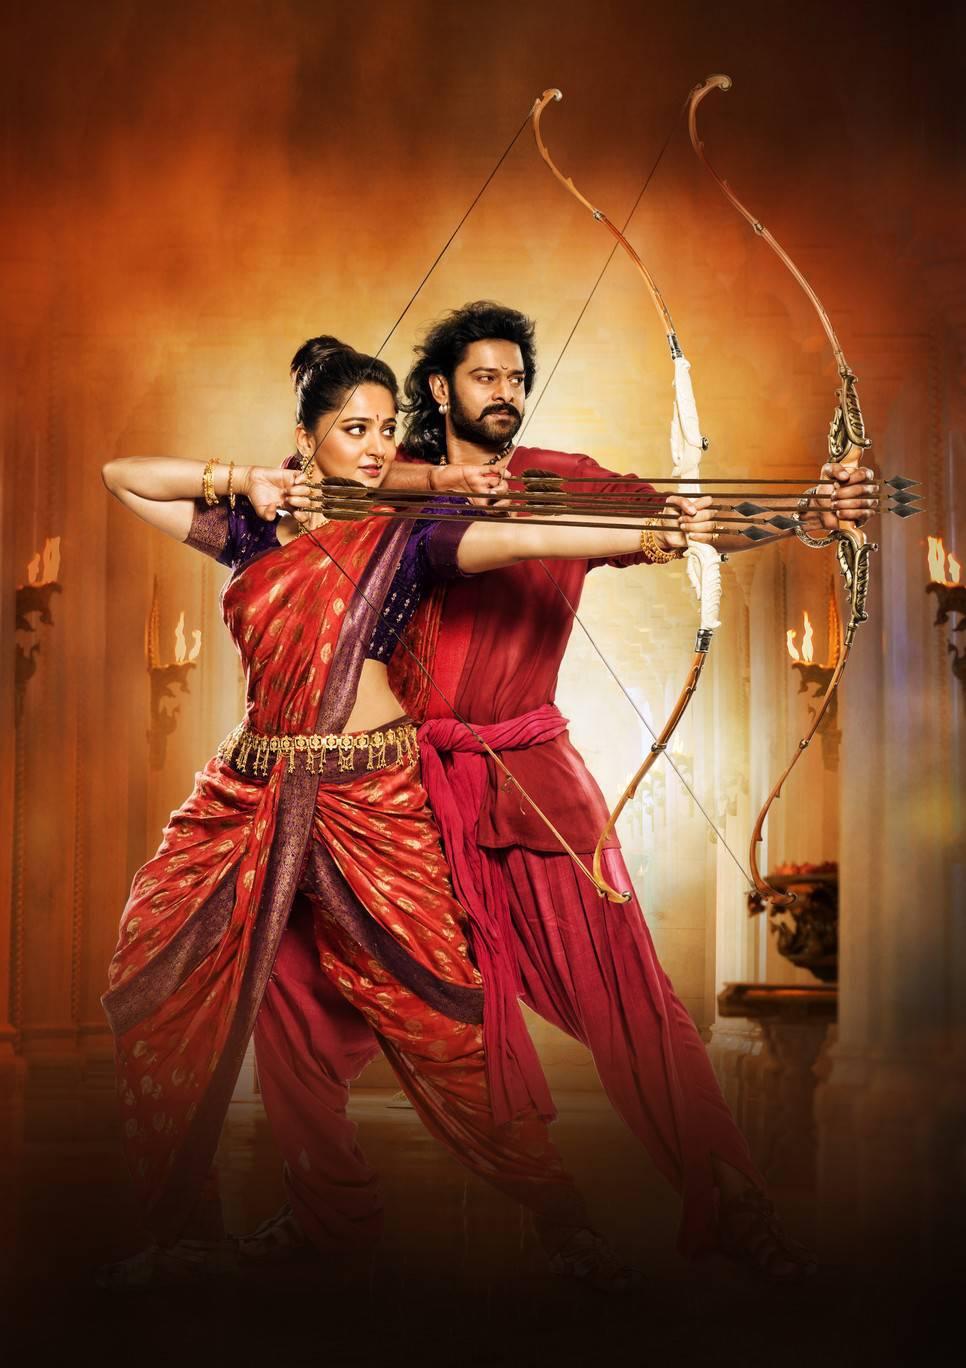 Anushka Prabhas Baahubali 2 Telugu Movie Poster